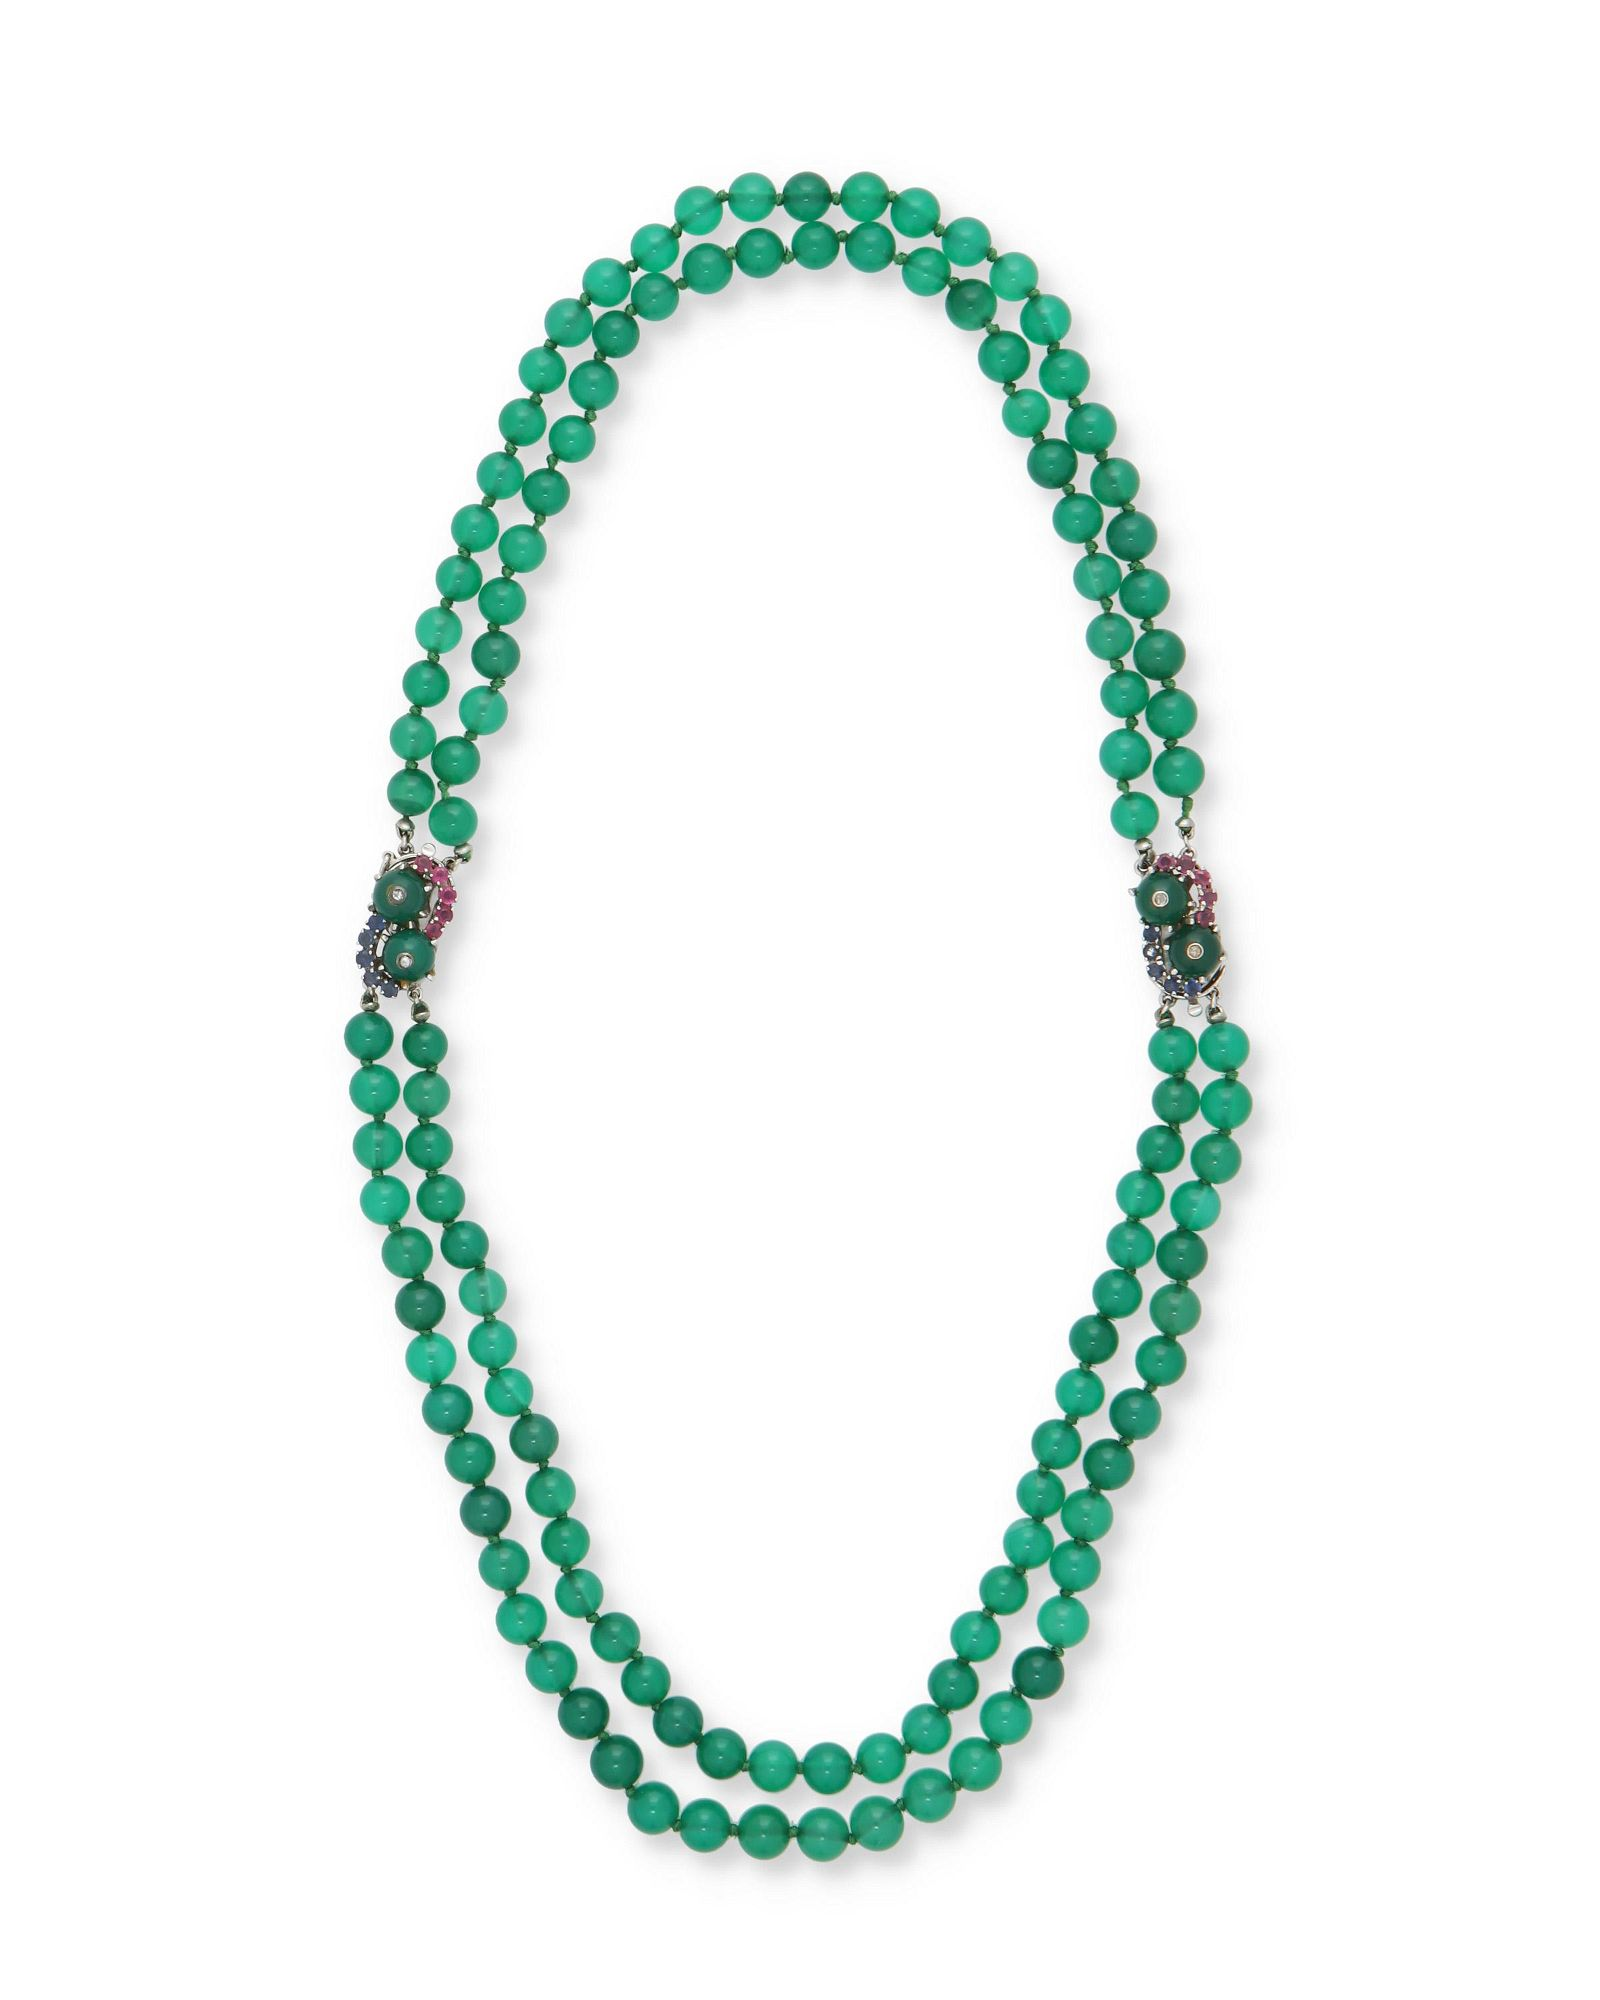 A chrysoprase and gem-set necklace